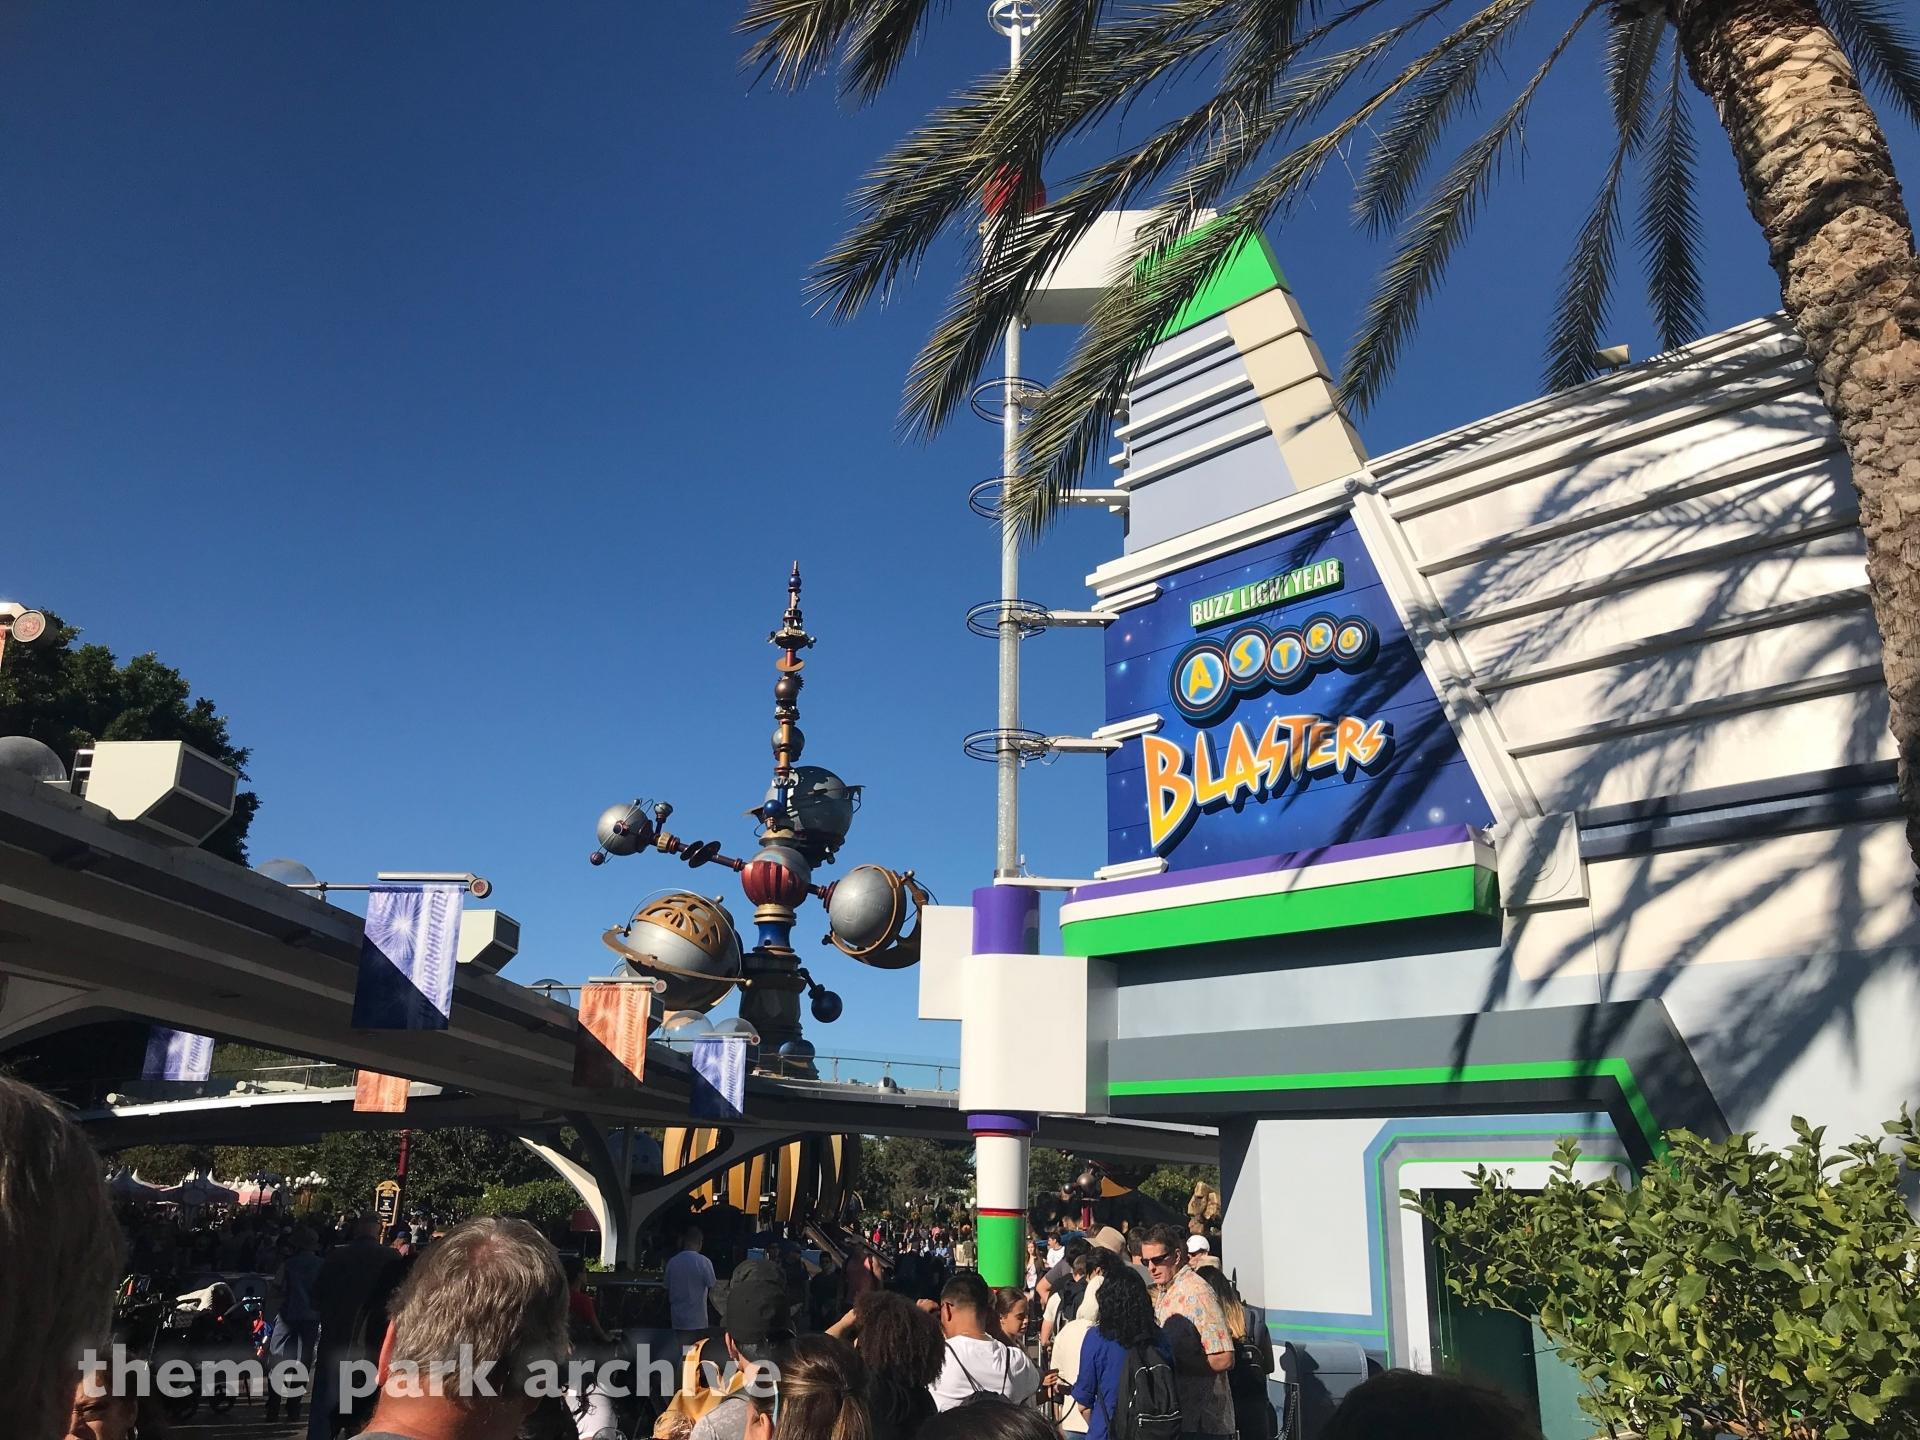 Buzz Lightyear Astro Blasters at Disneyland